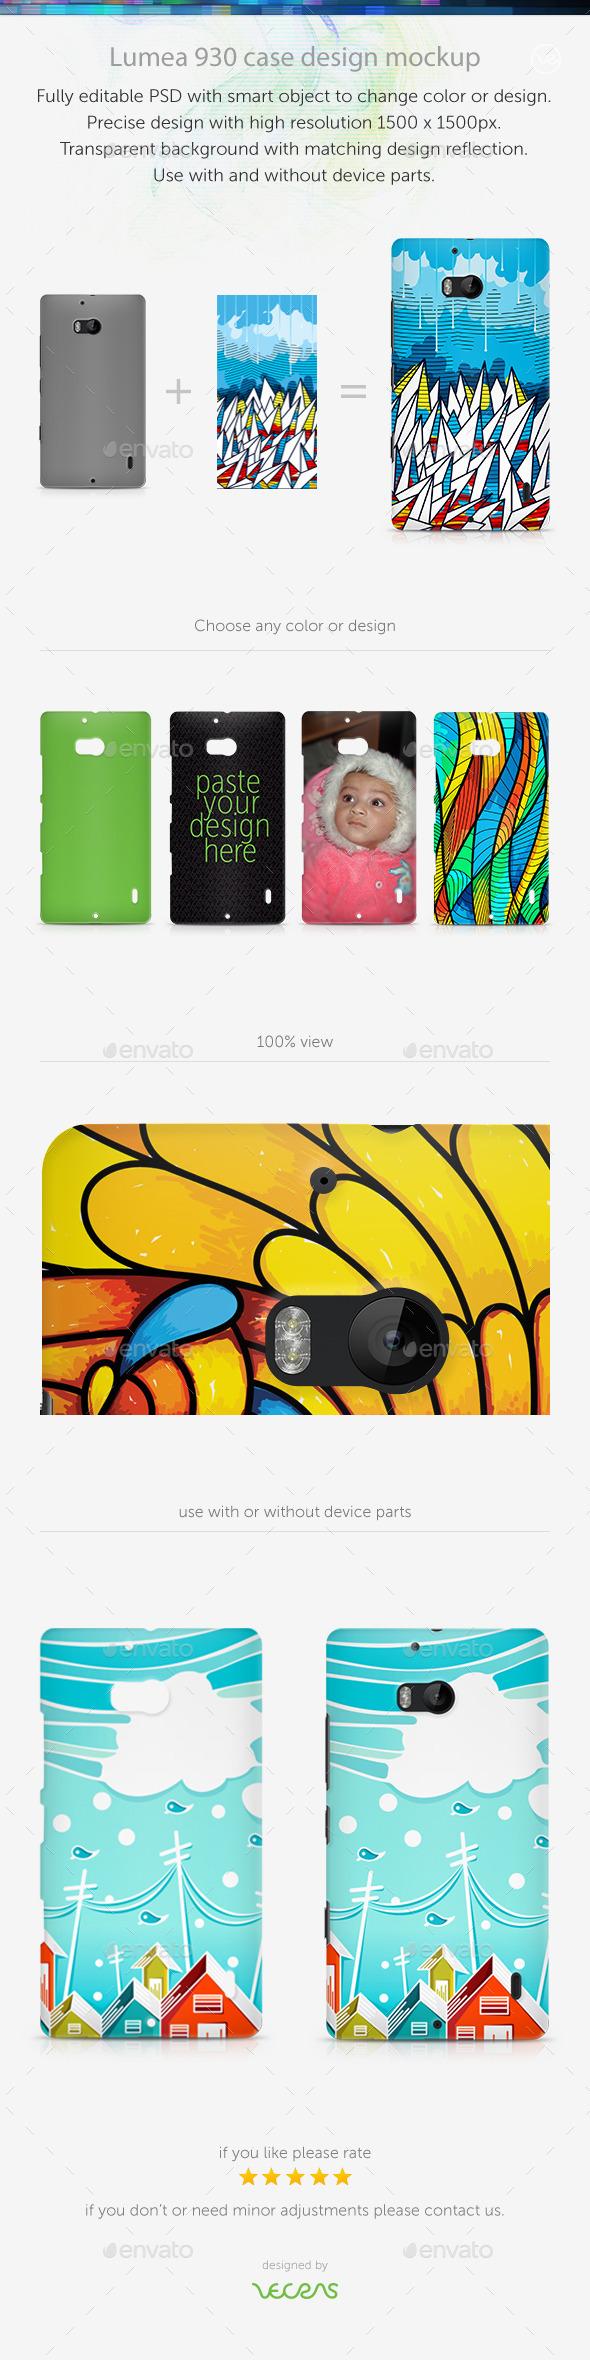 GraphicRiver Lumea 930 Case Design Mockup 10696055